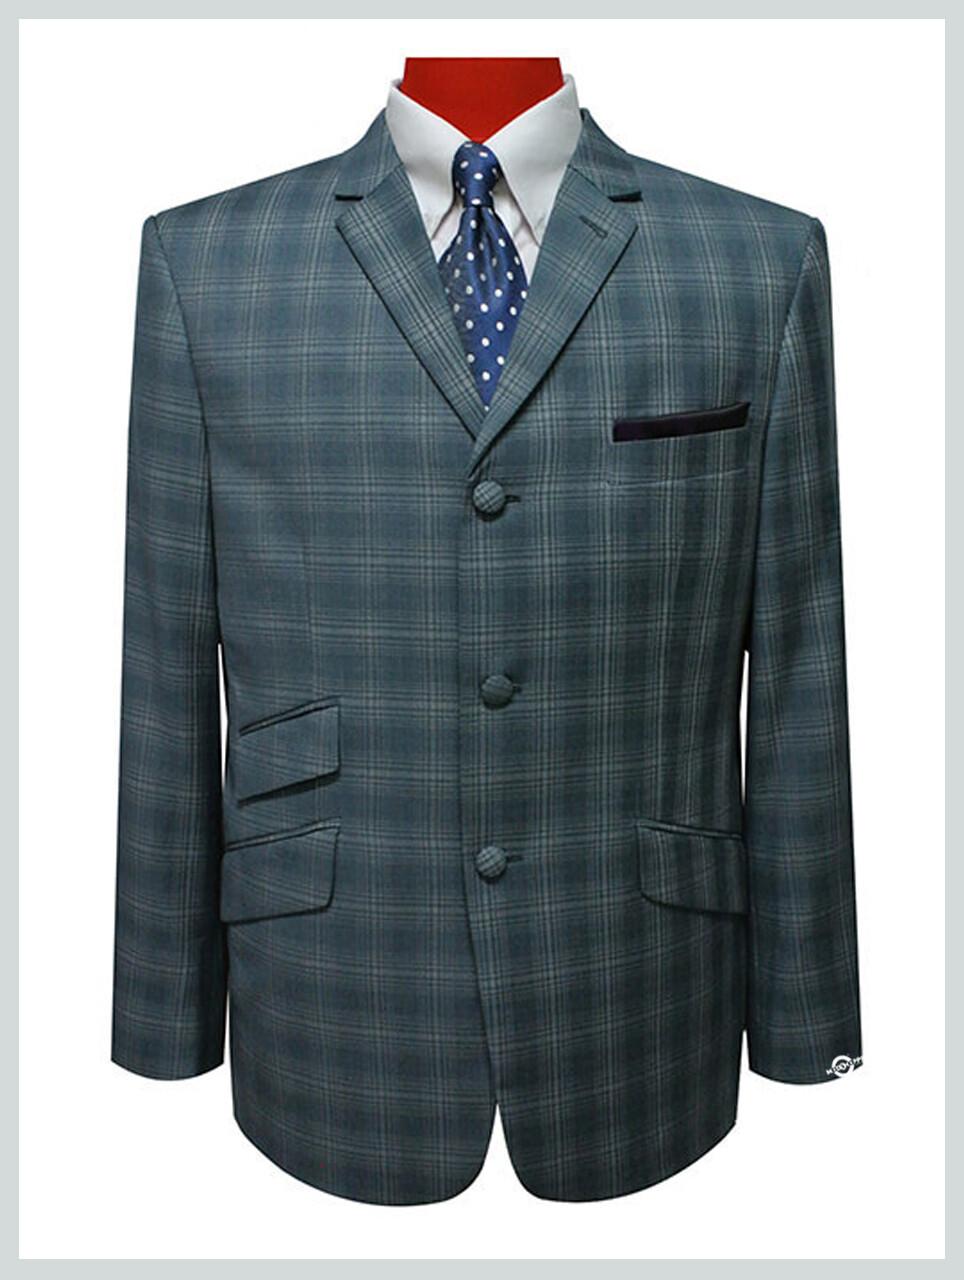 check blazer tailored 60s check 3 button ssea-green blazer jacket for men.